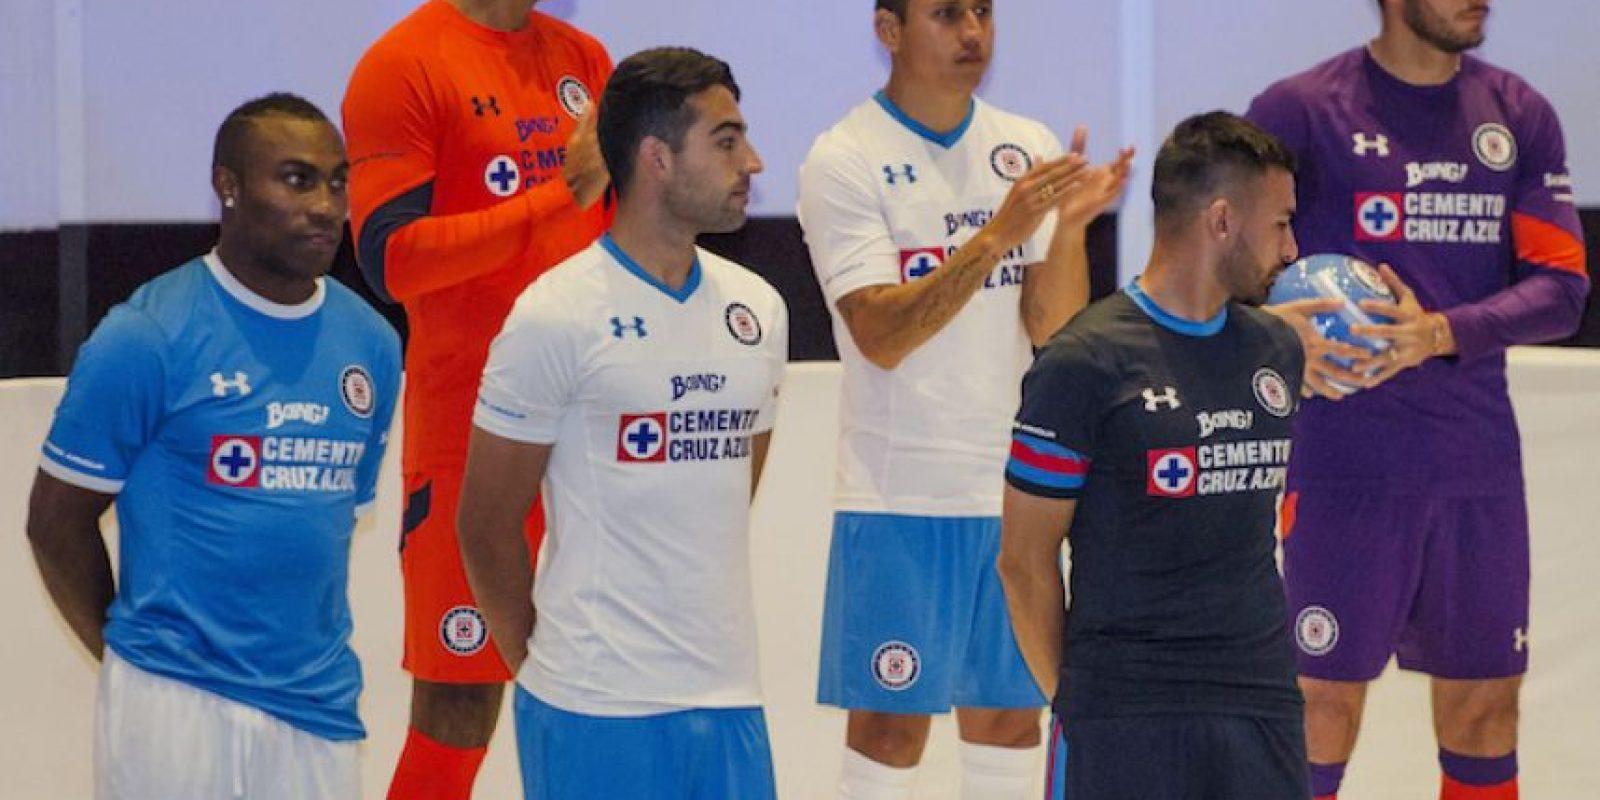 Cruz Azul presentó innovadora vestimenta para el Apertura 2016 Foto:Mexsport